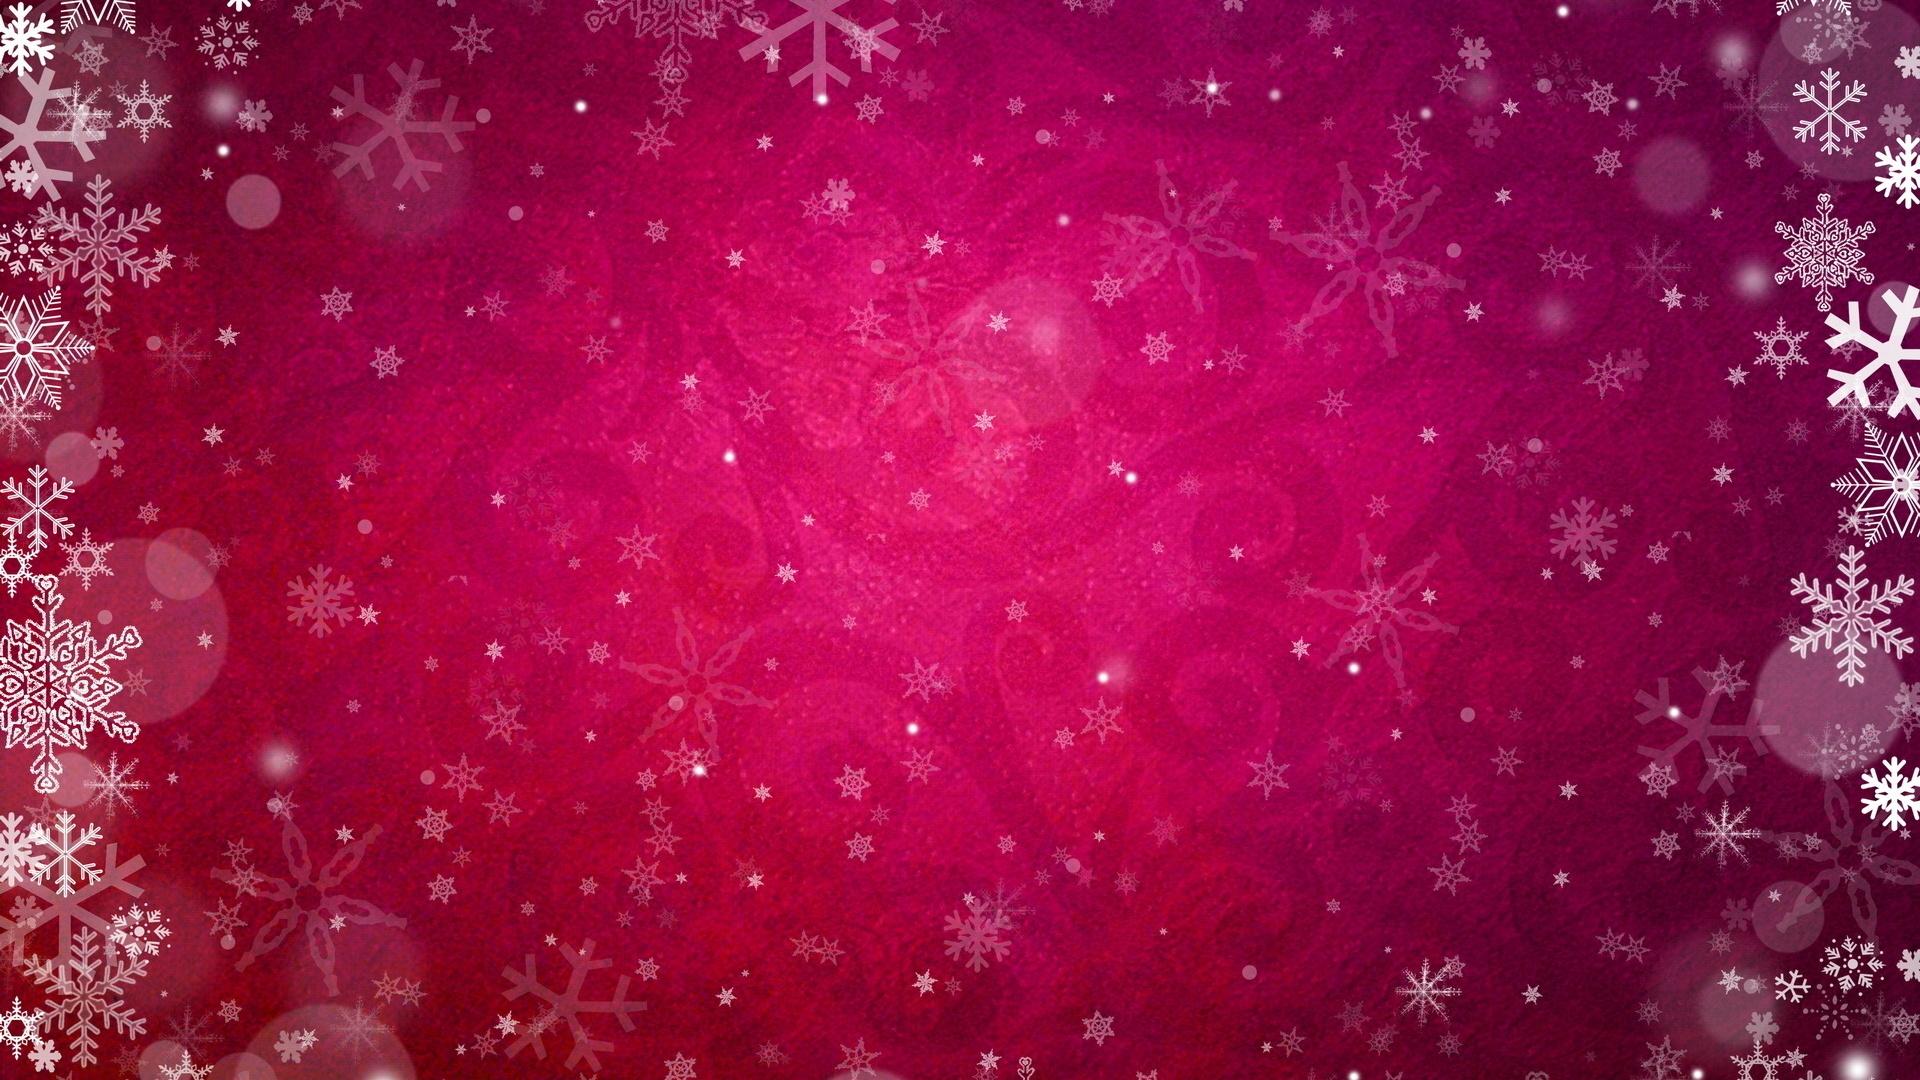 Wallpaper Red Snow Texture Circle Snowflakes Pink